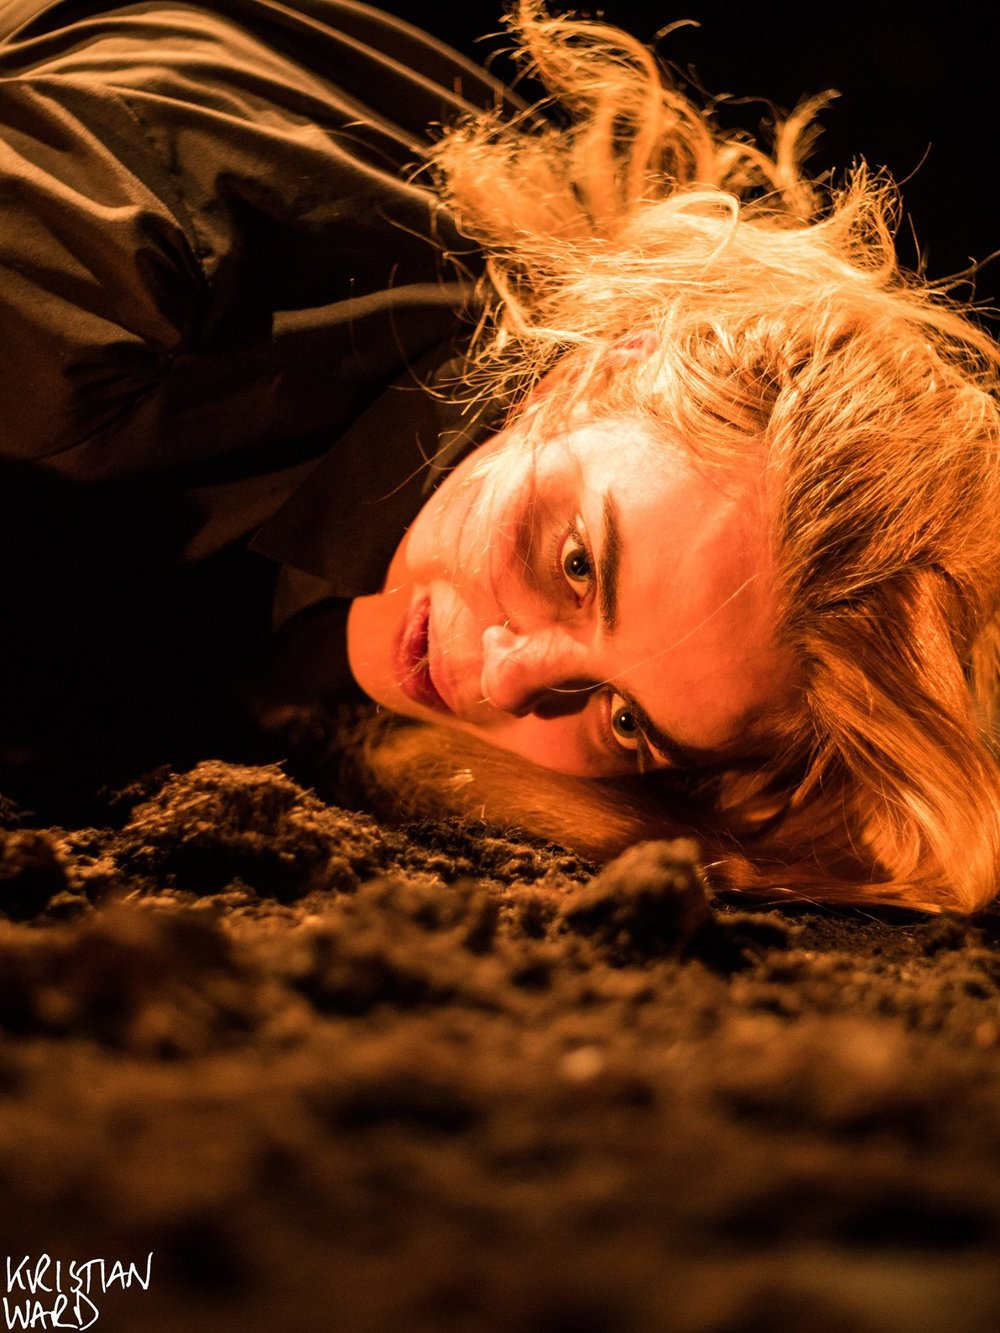 Perpetual | Unnur Sesselia Ólafsdóttir and Jimmy Addy | Photo Credit: Kristian Ward